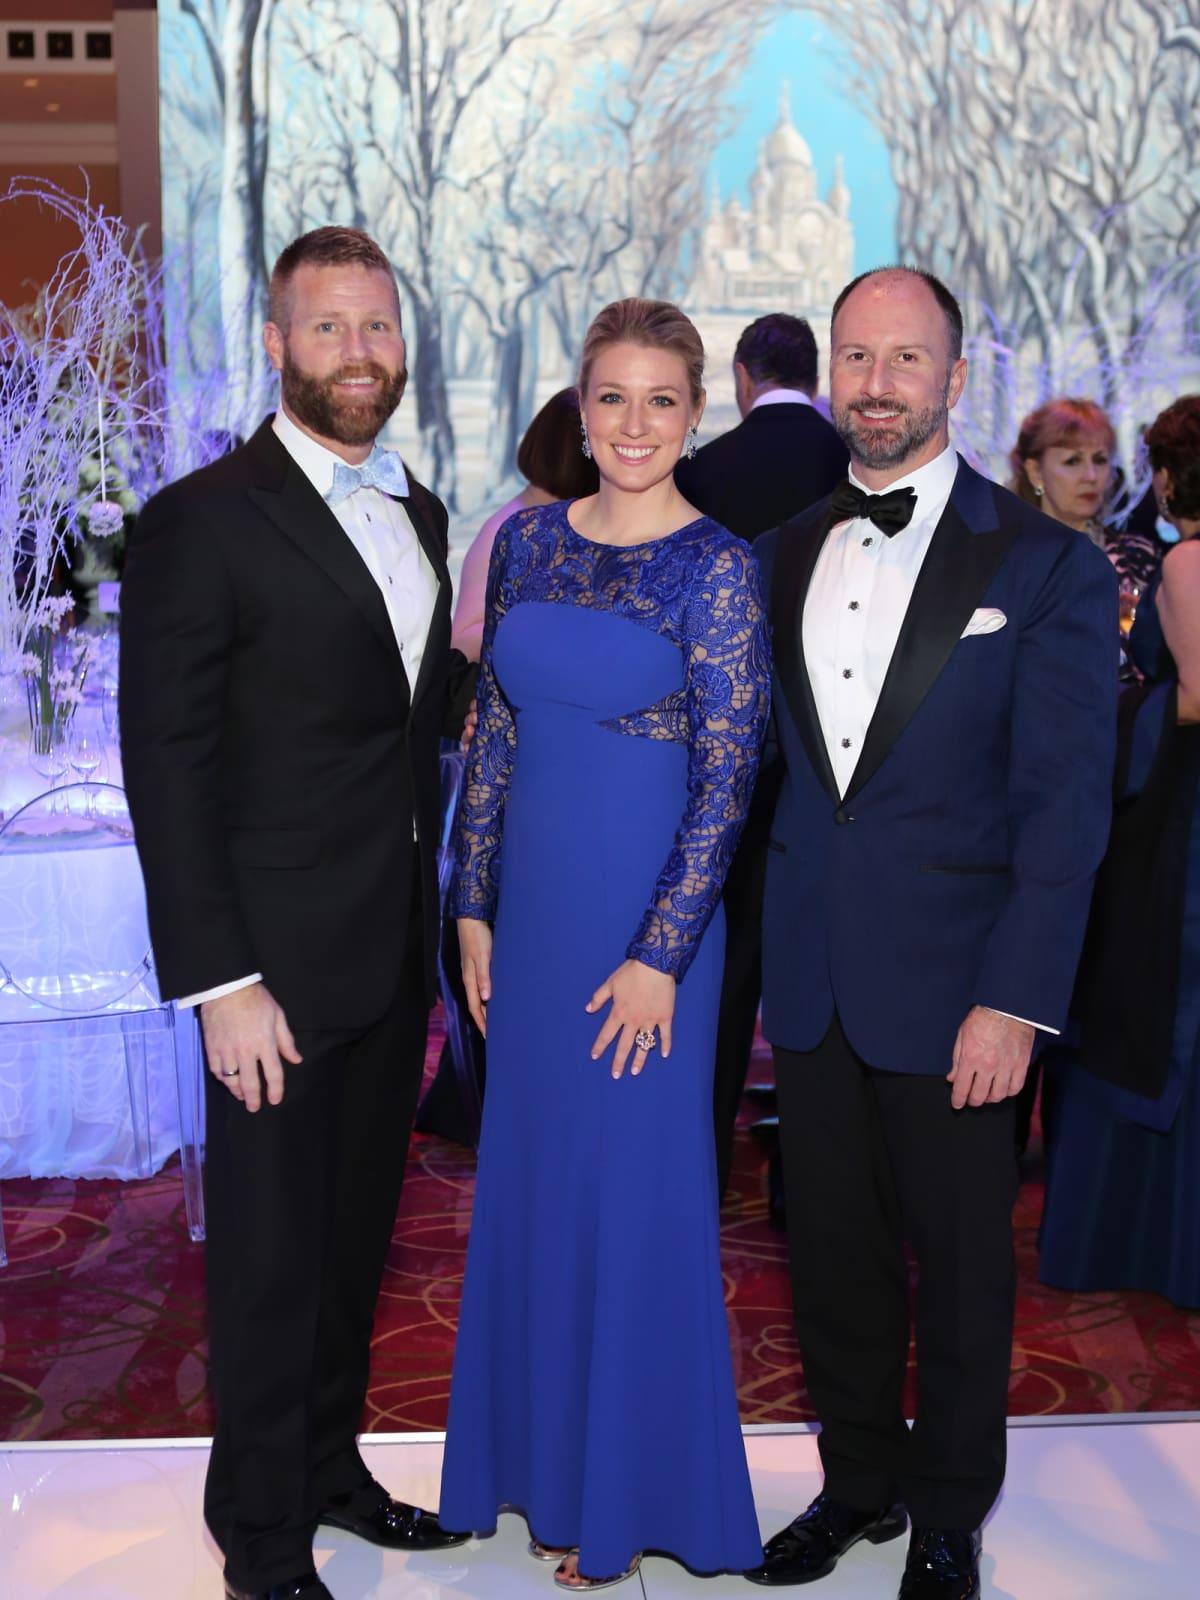 Houston Ballet Ball, Feb. 2016,  Kevin Black, Christina Stith, Tony Bradfield